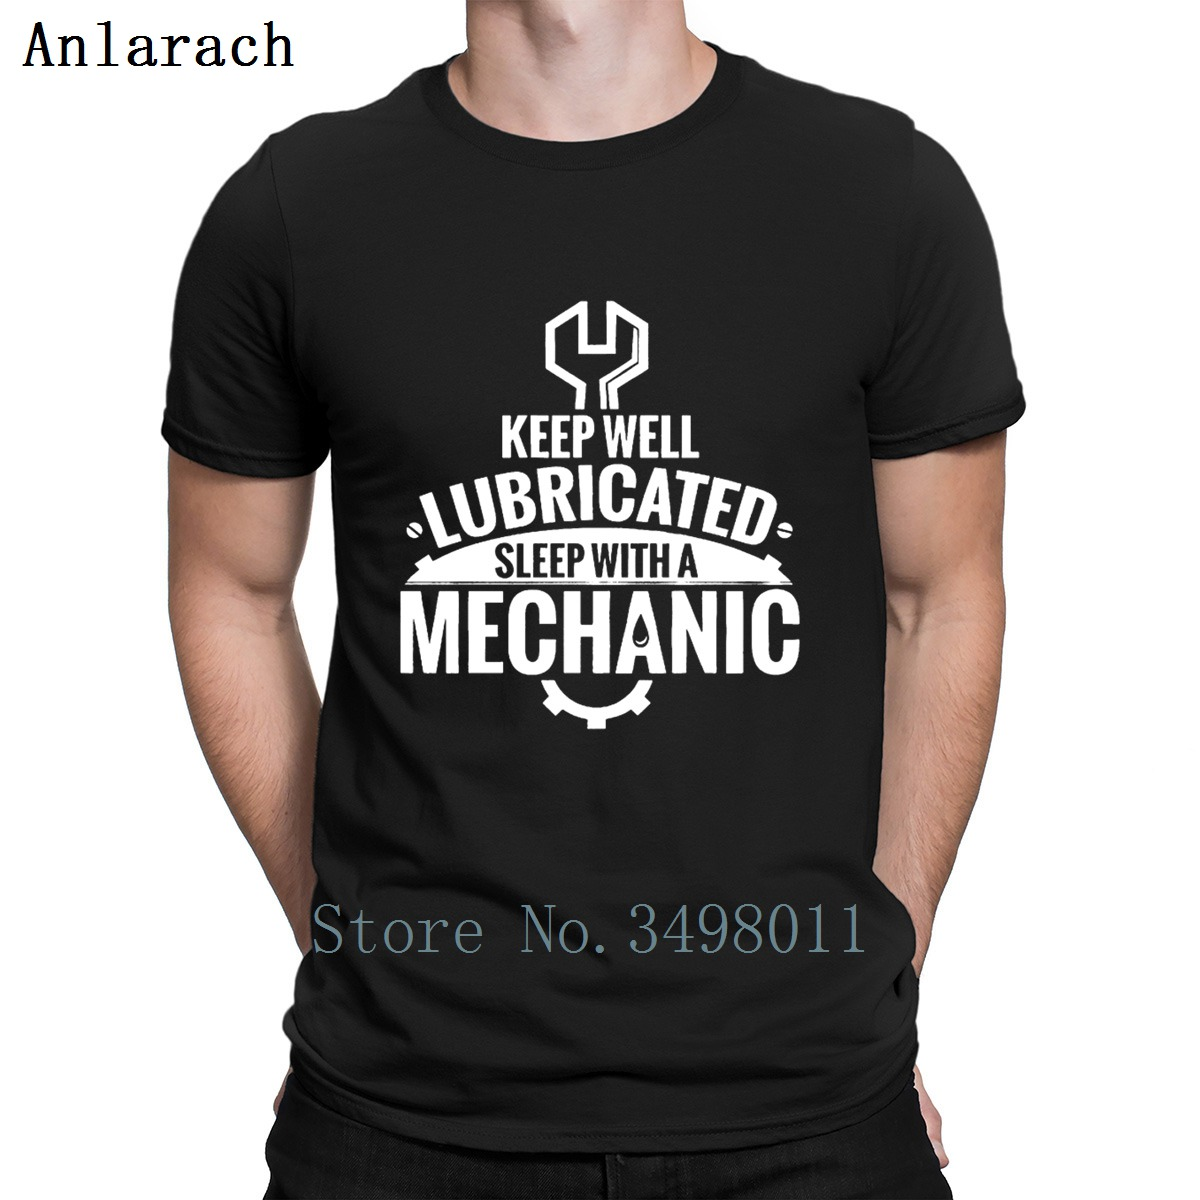 b0a18f0c Keep Well Lubricated Sleep With A Mechanic Funny G T Shirt Customize Tee  Shirt Crew Neck Interesting Comical Leisure Shirt